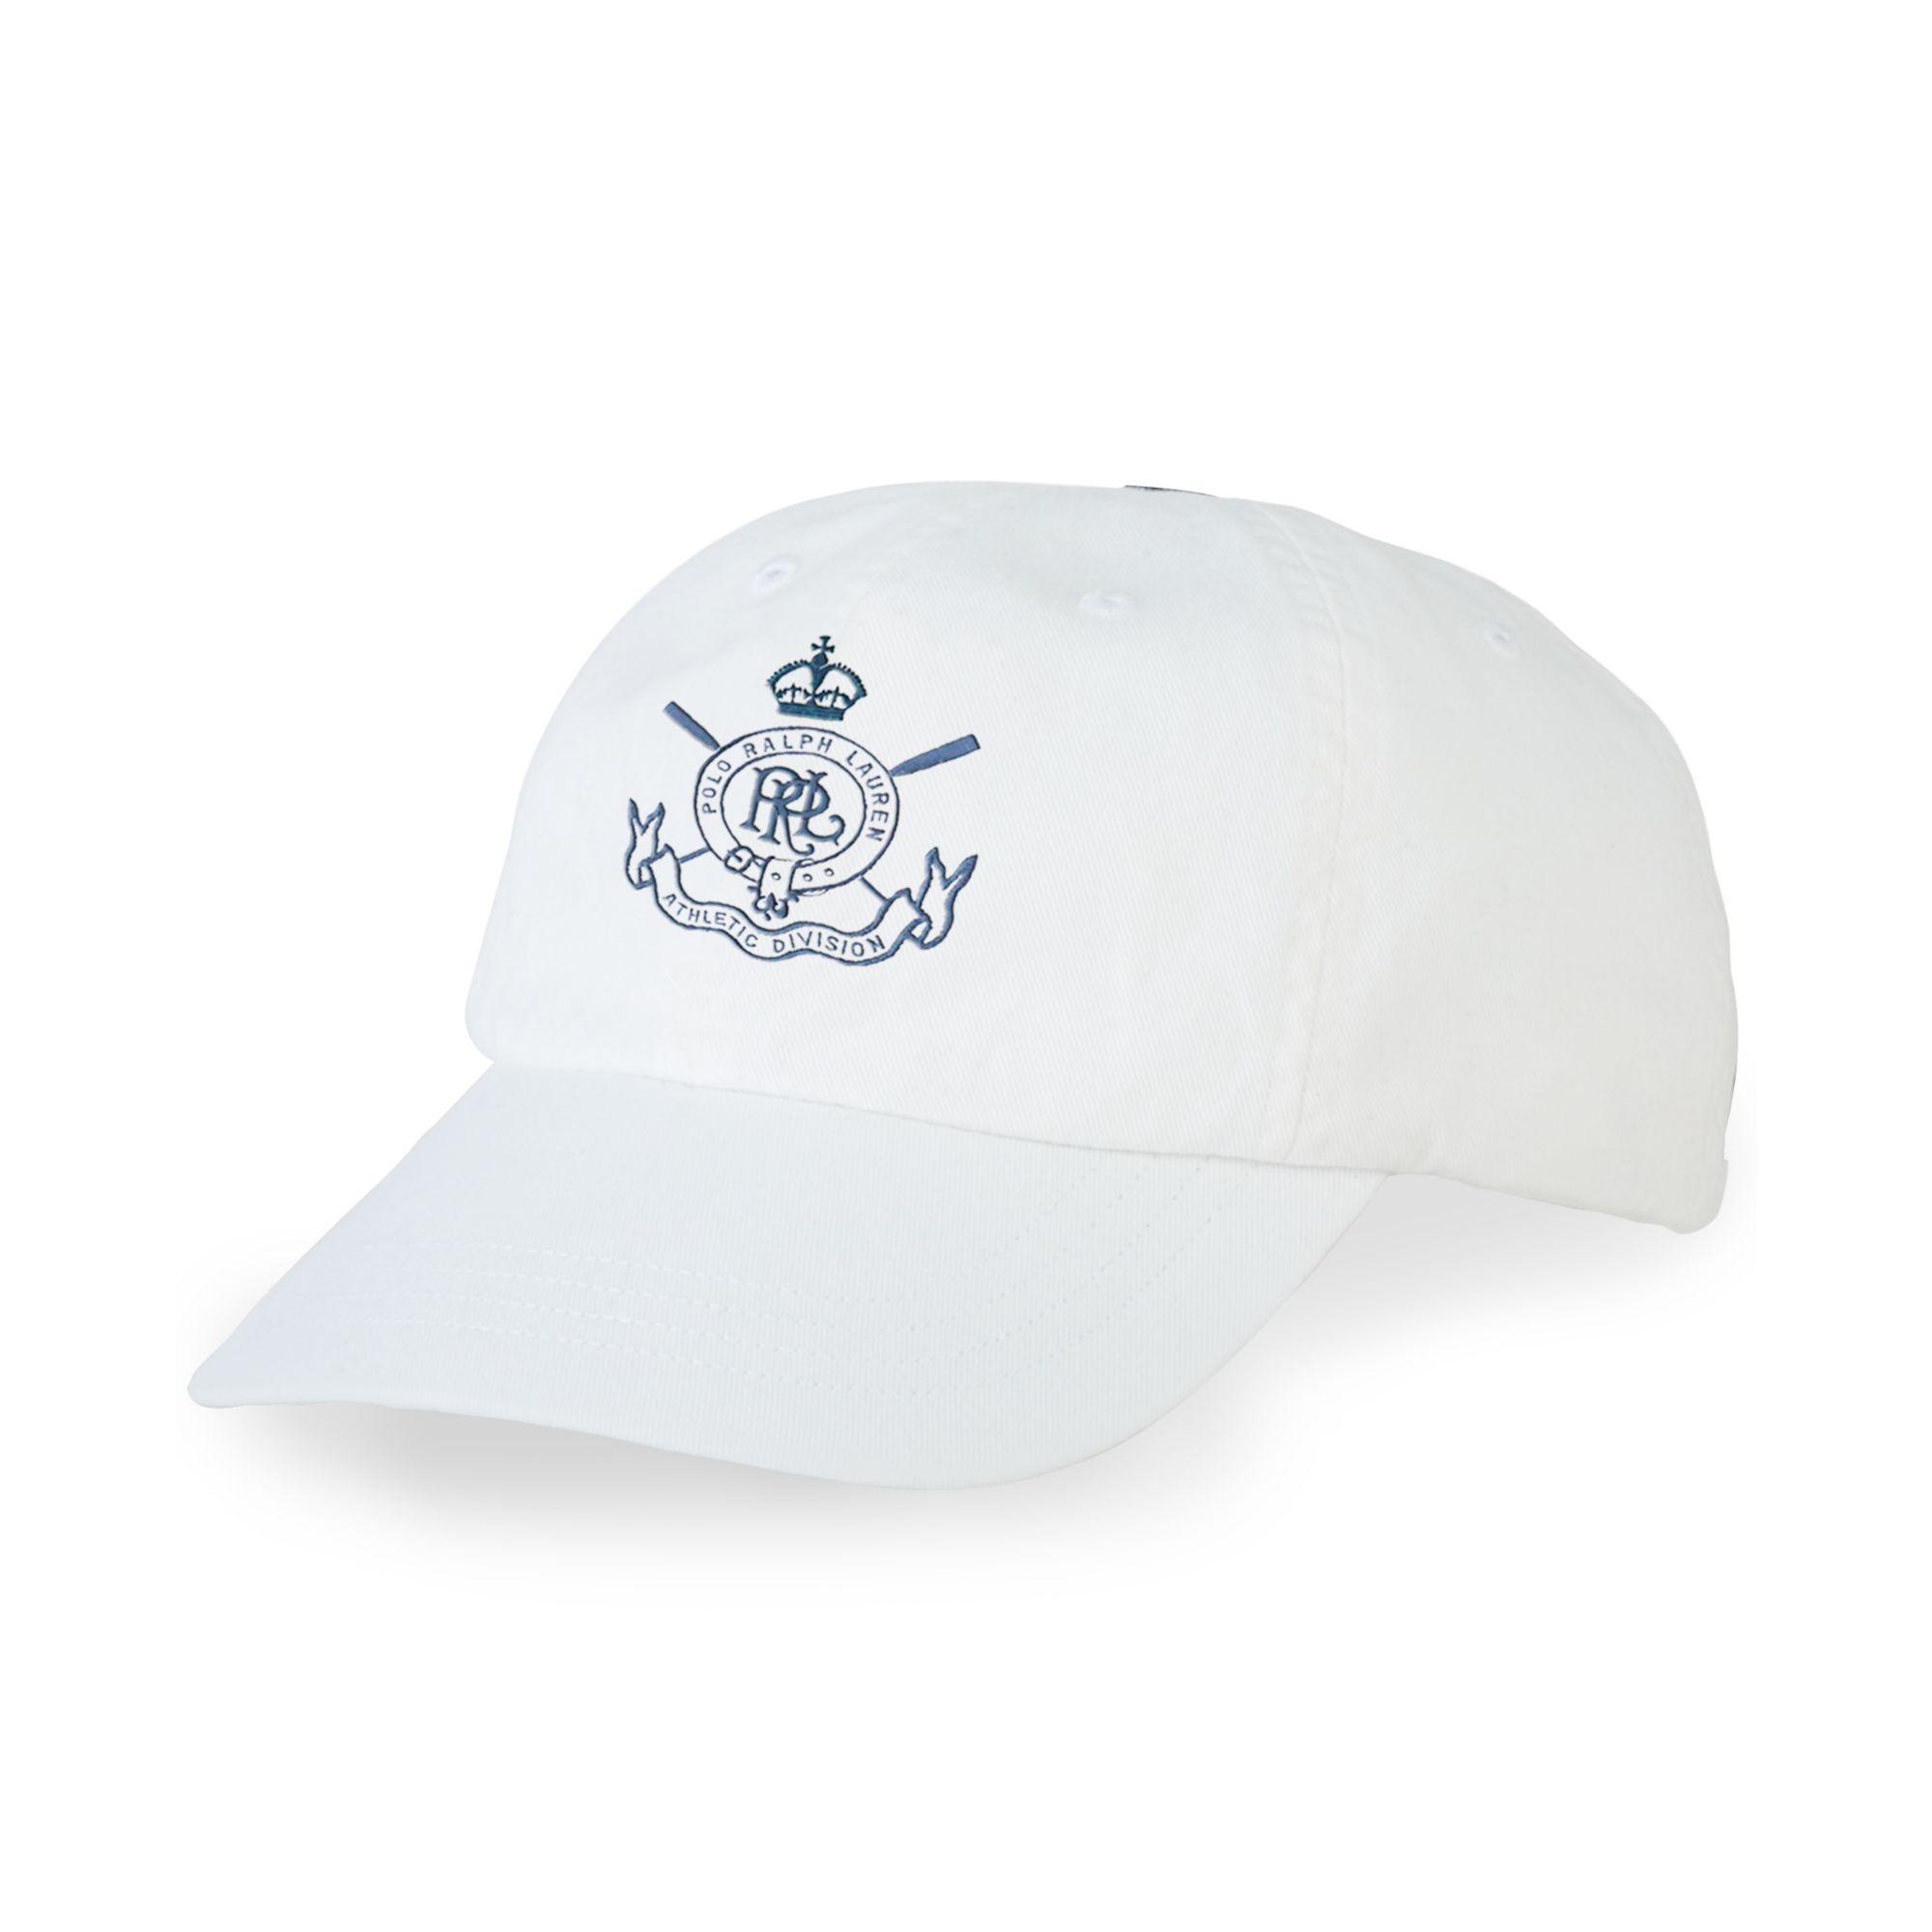 ralph lauren polo sag harbor chino cap in white for men lyst. Black Bedroom Furniture Sets. Home Design Ideas